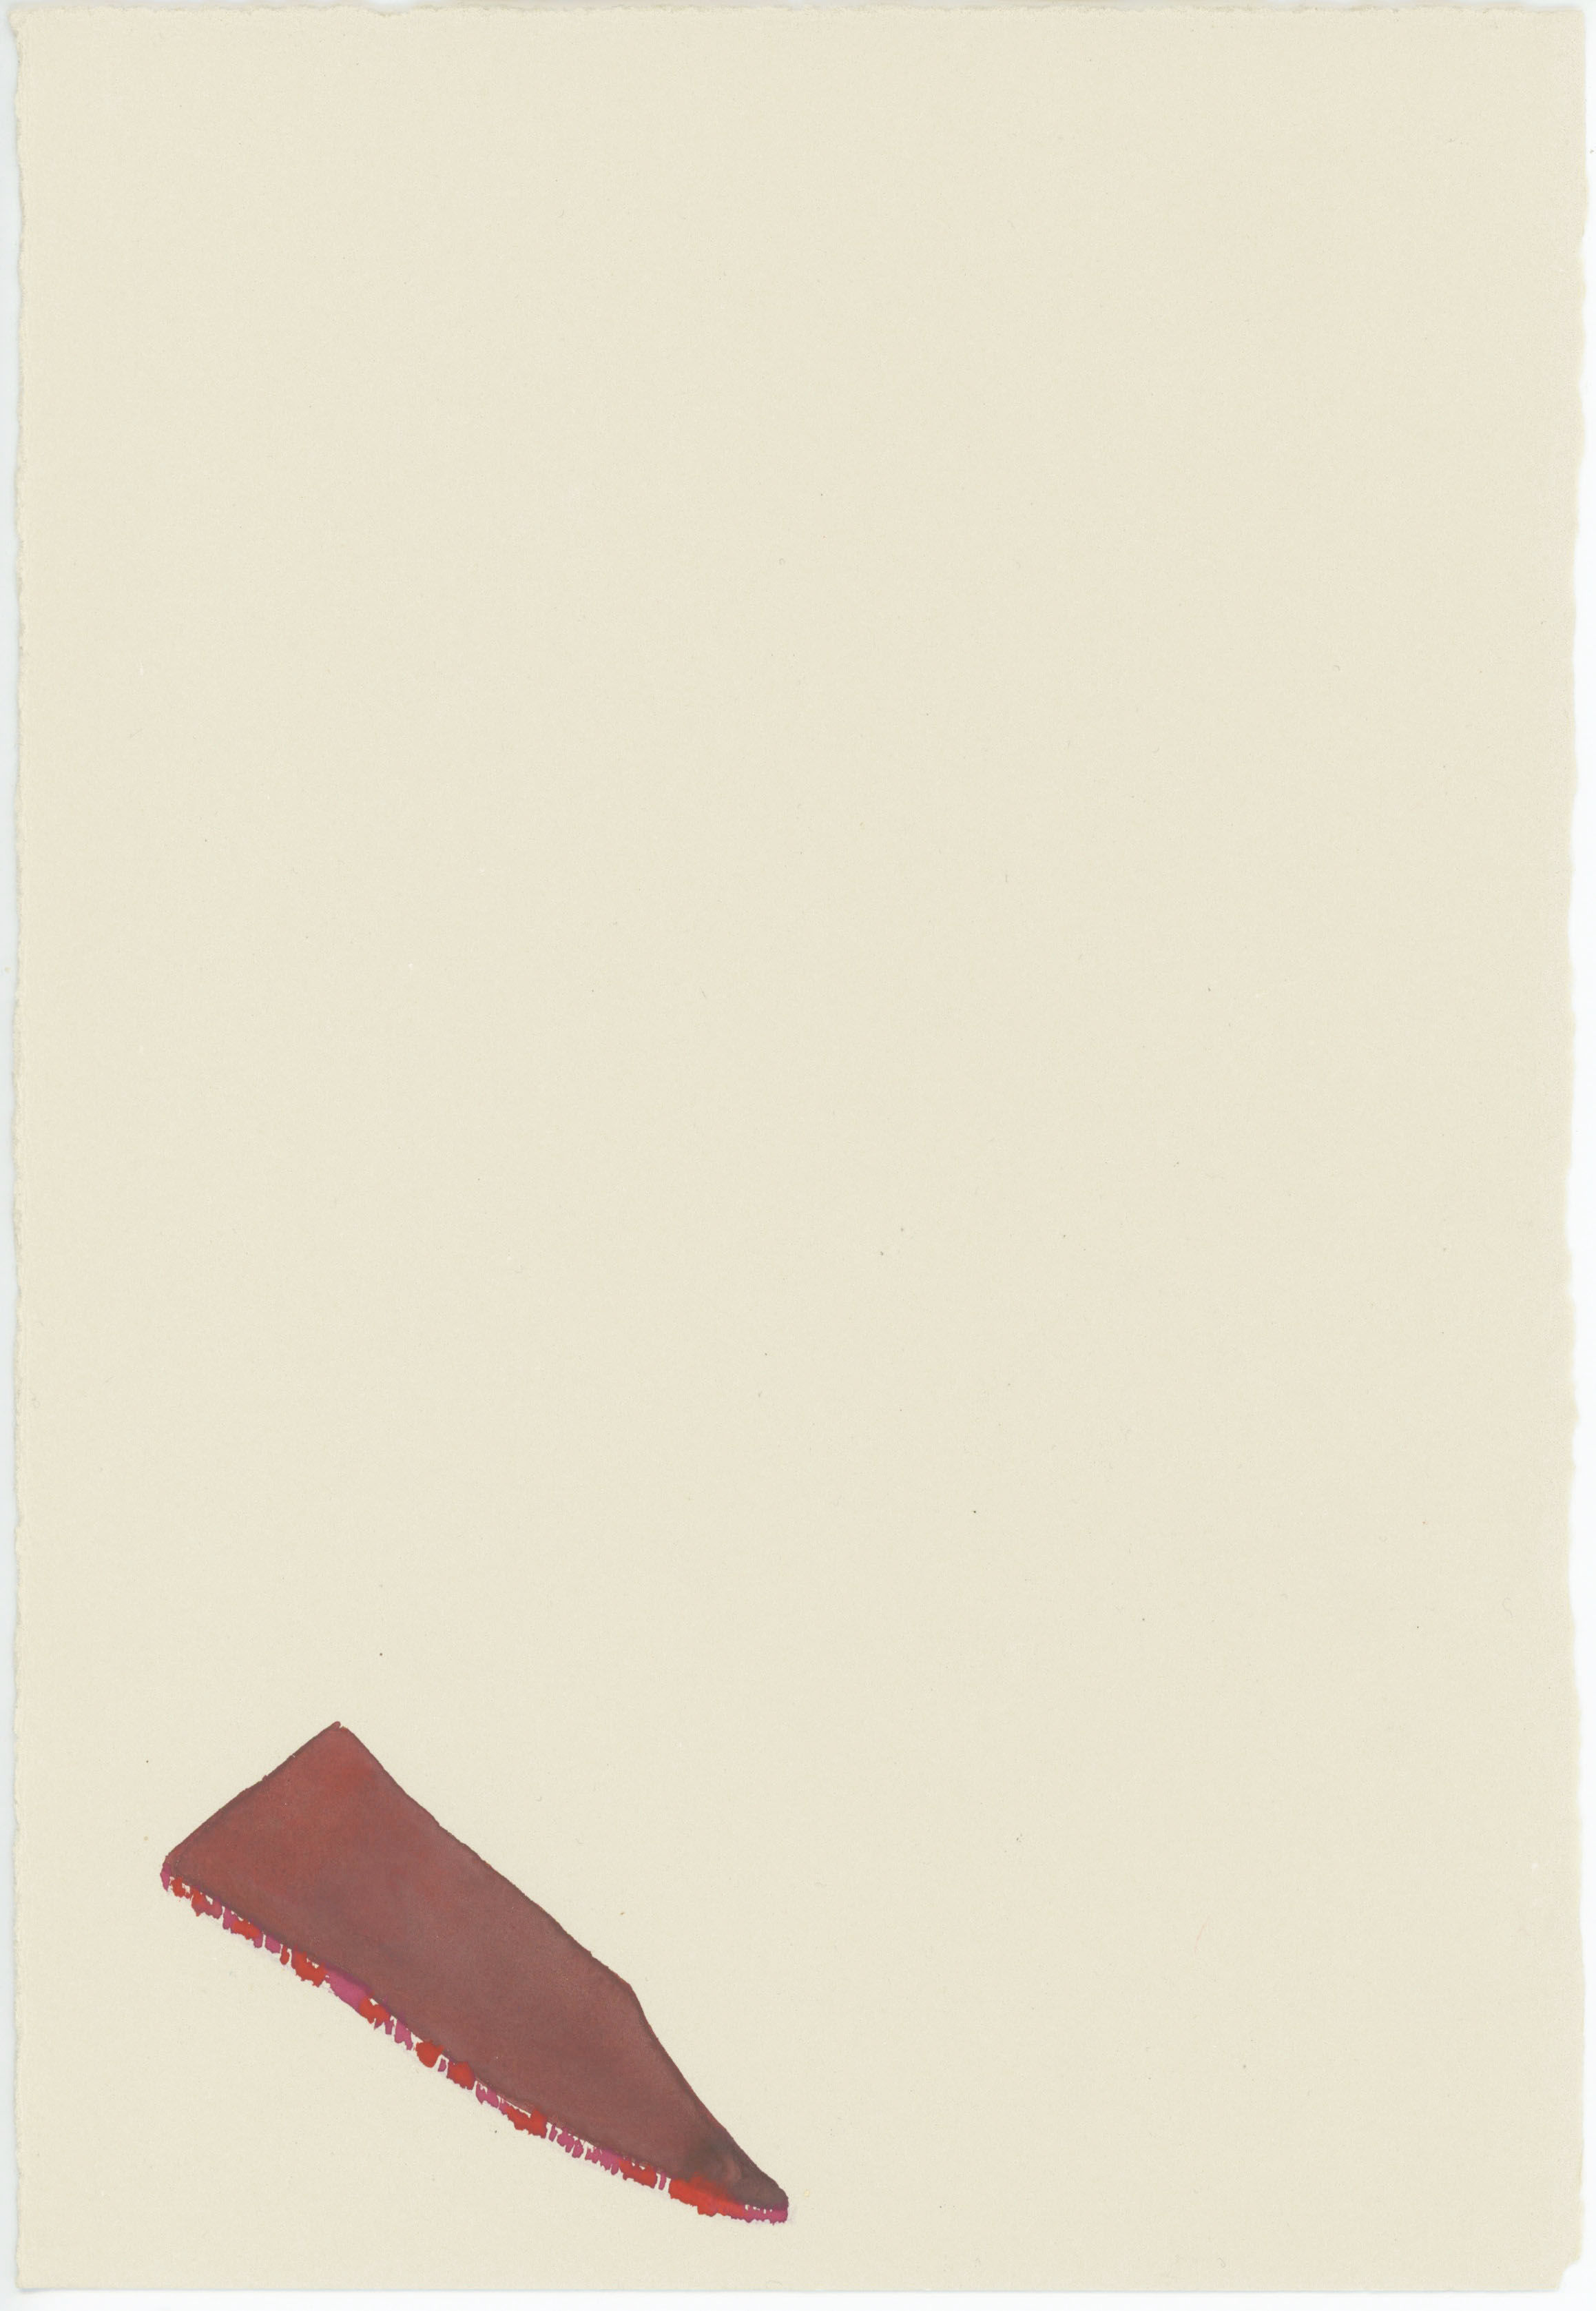 52. Watercolour on paper. 20 x 28cm